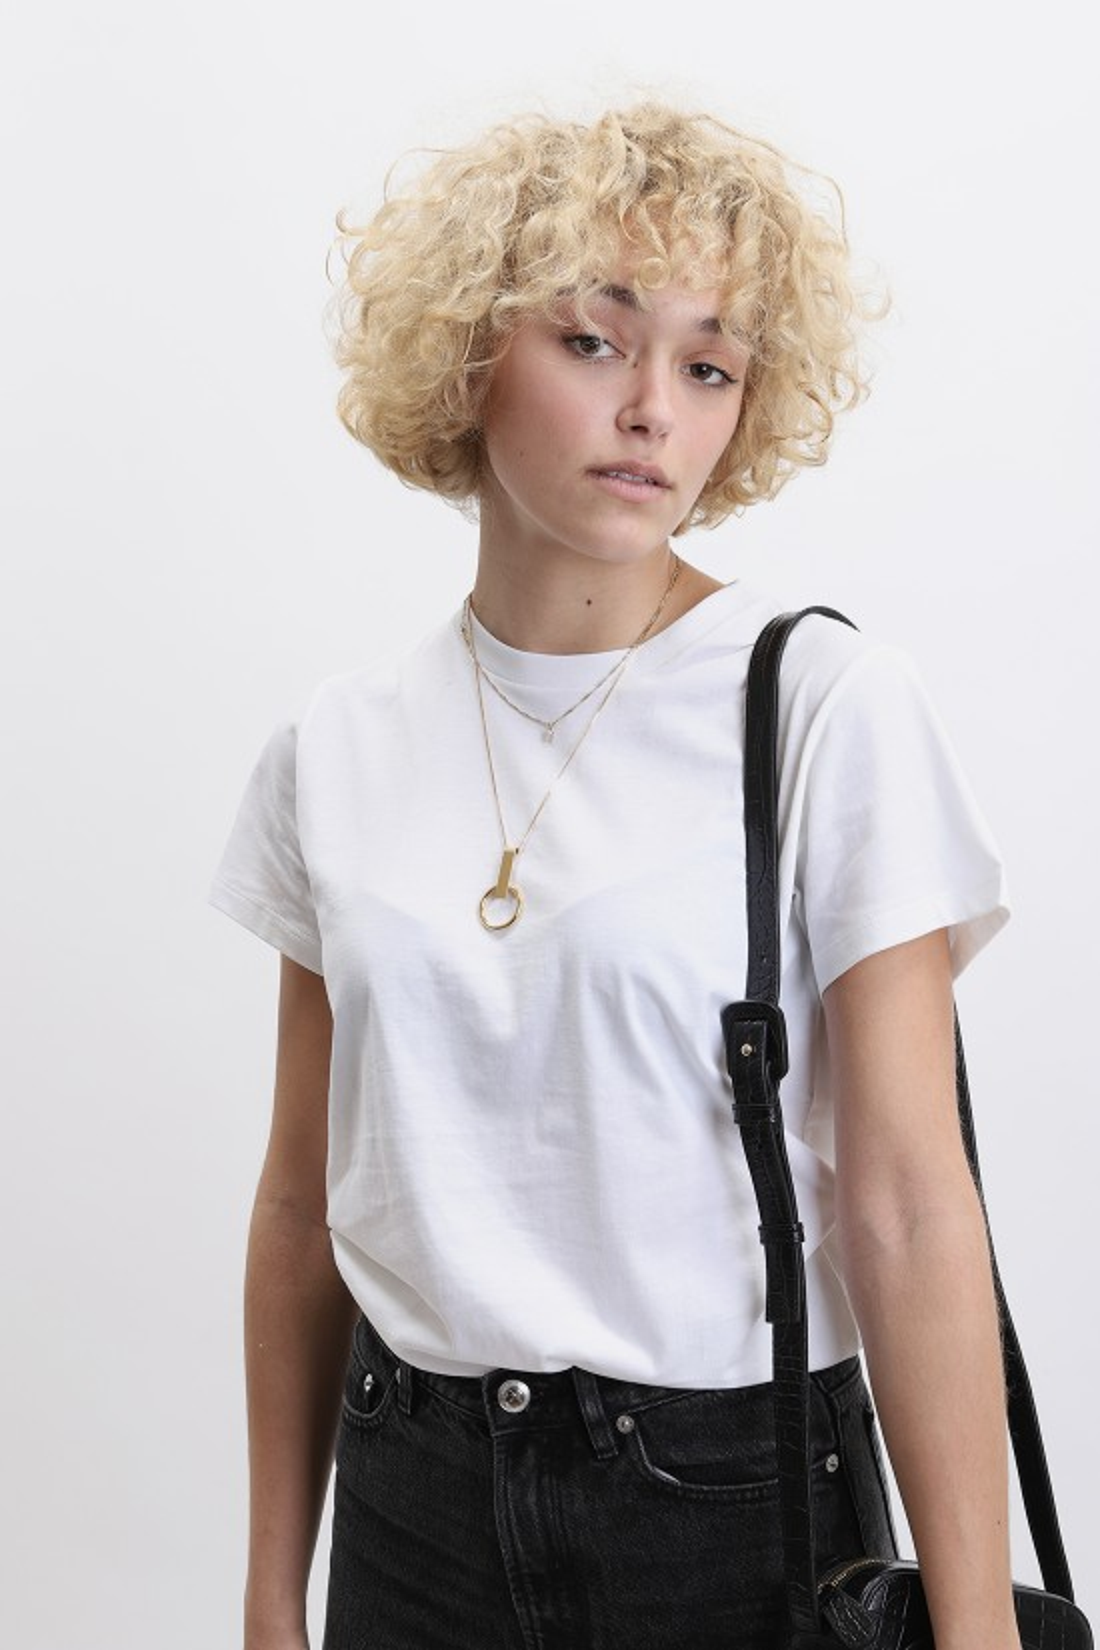 BASERANGE / Tee shirt White